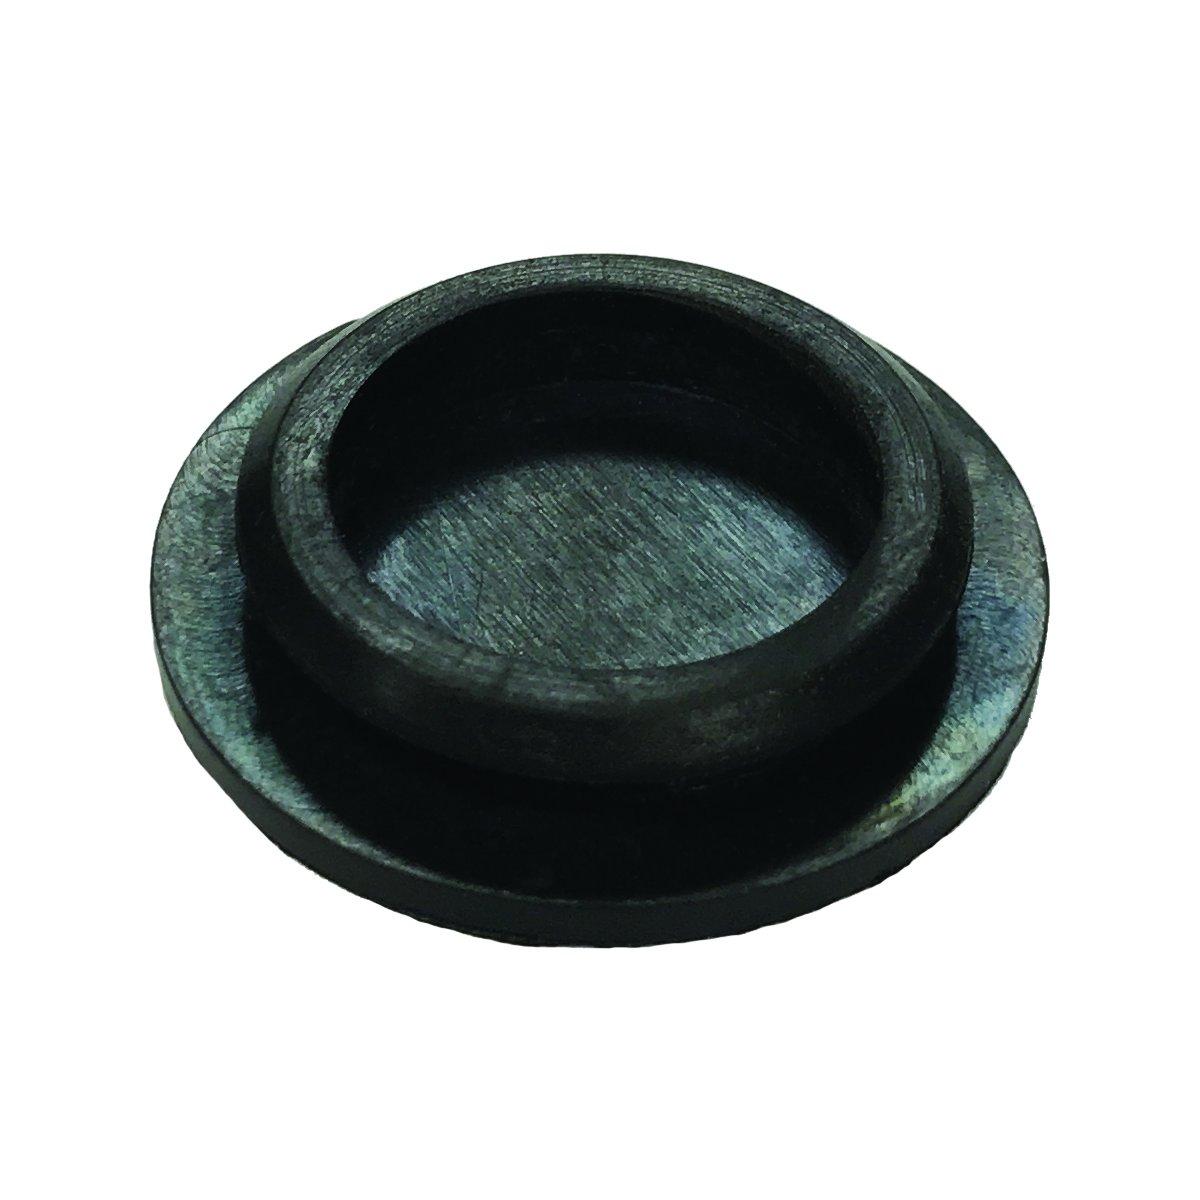 LCI Power Tongue Jack Lippert Components 225875 Cover Side Plug V2